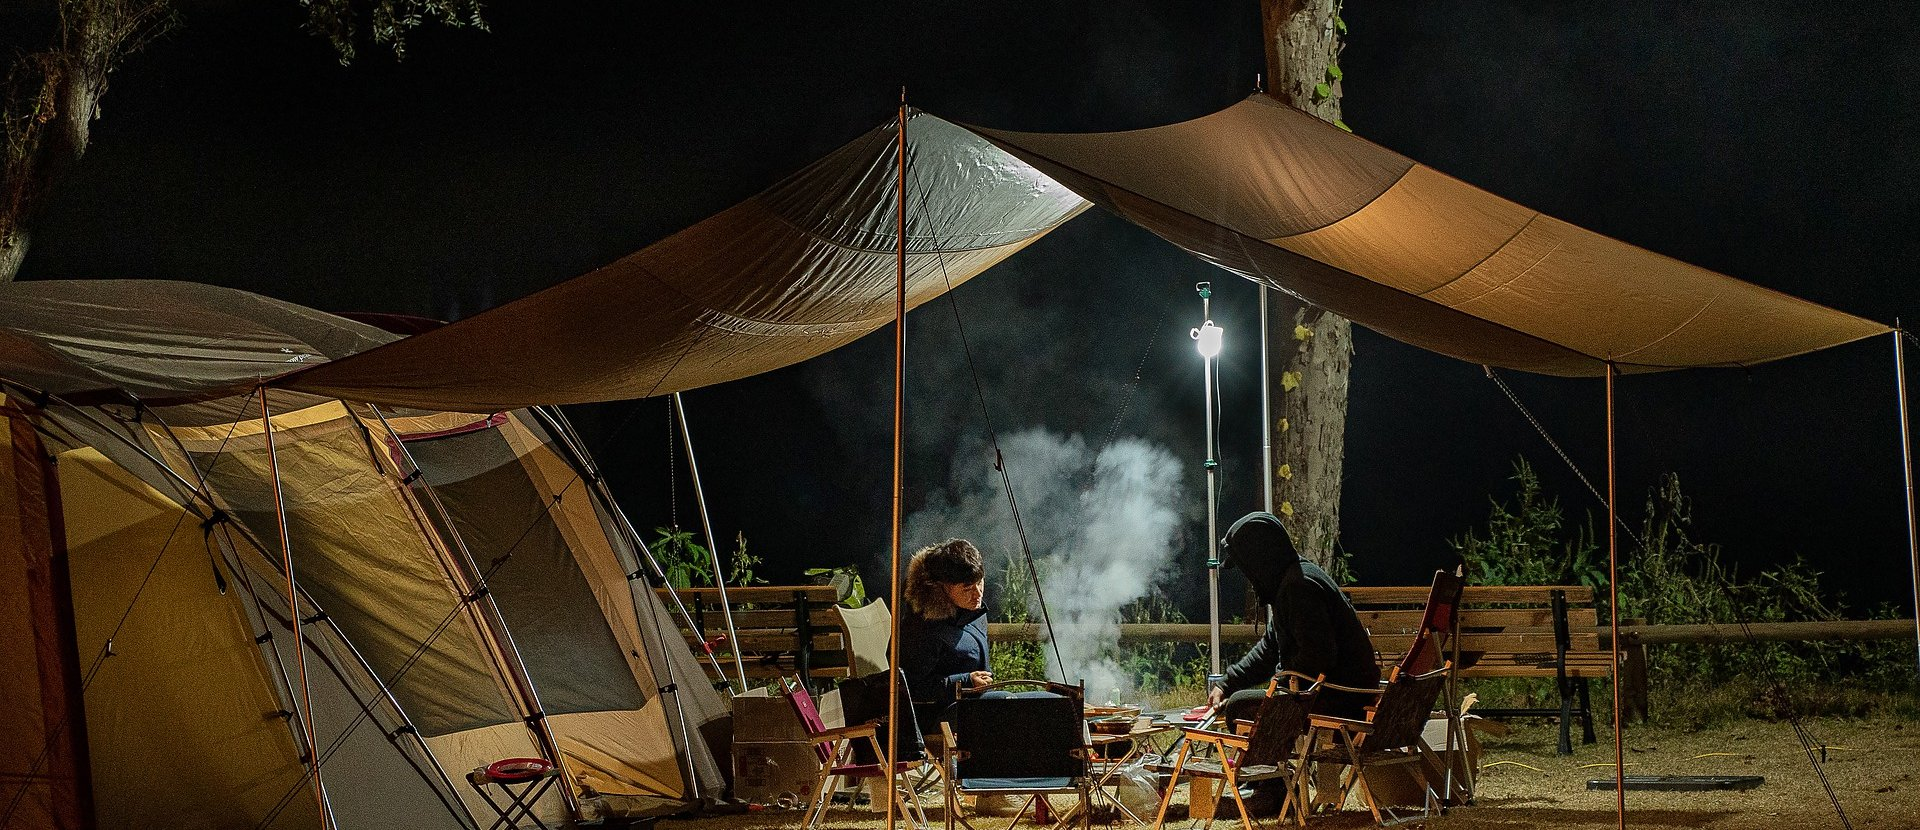 Camping & Caravaning in der Oberlausitz